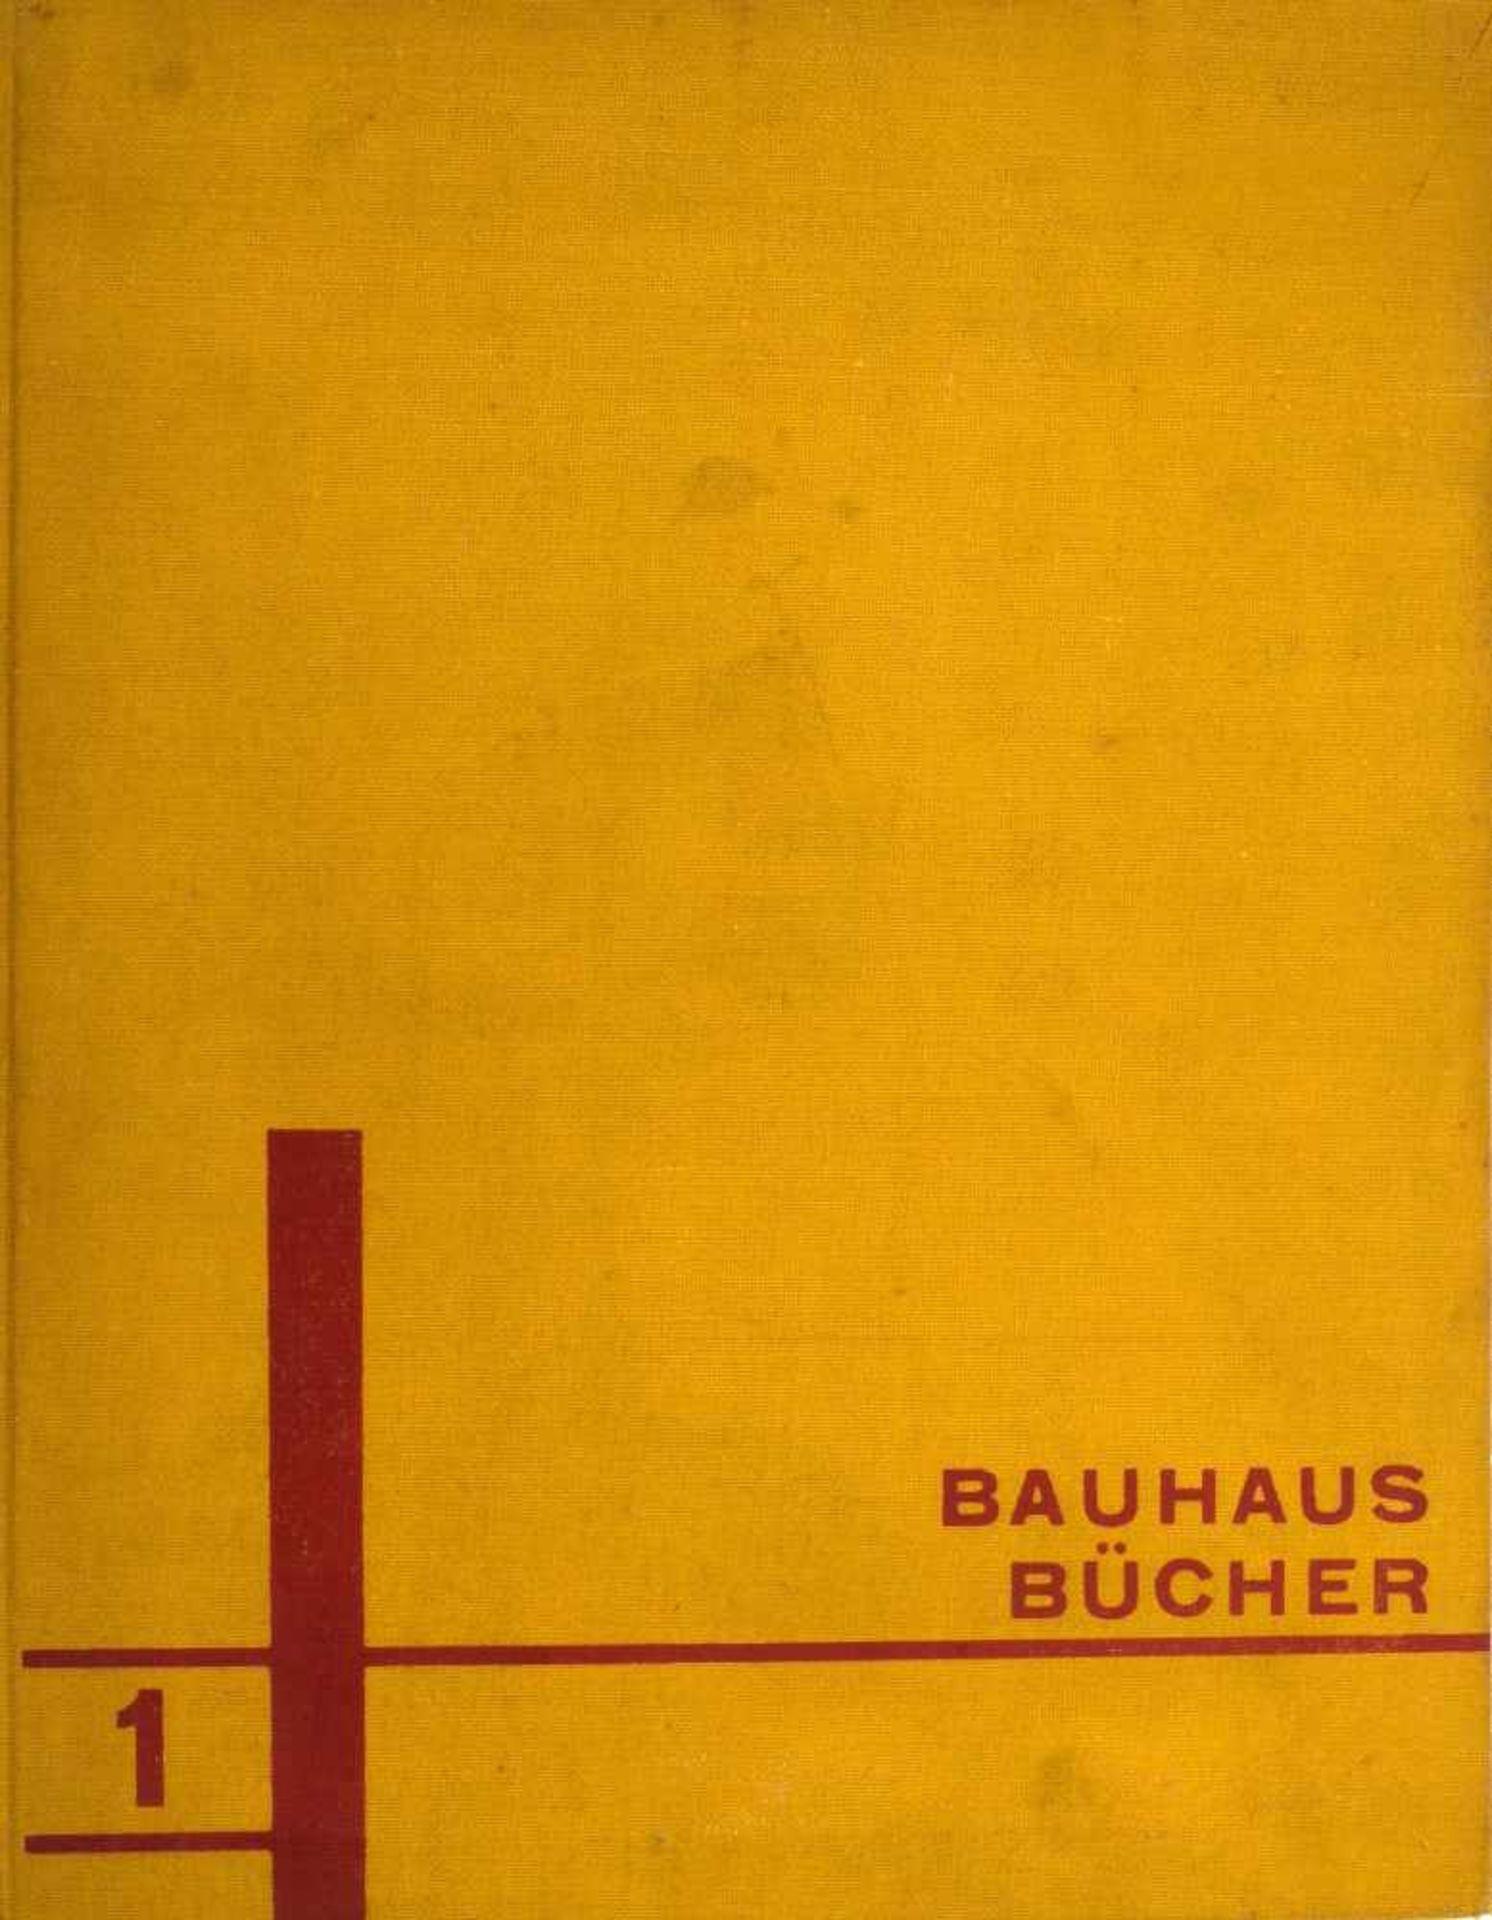 Walter Gropius; Laszlo Moholy-Nagy Bauhausbücher 1 Internationale Architektur, 1925 Walter Gropius/